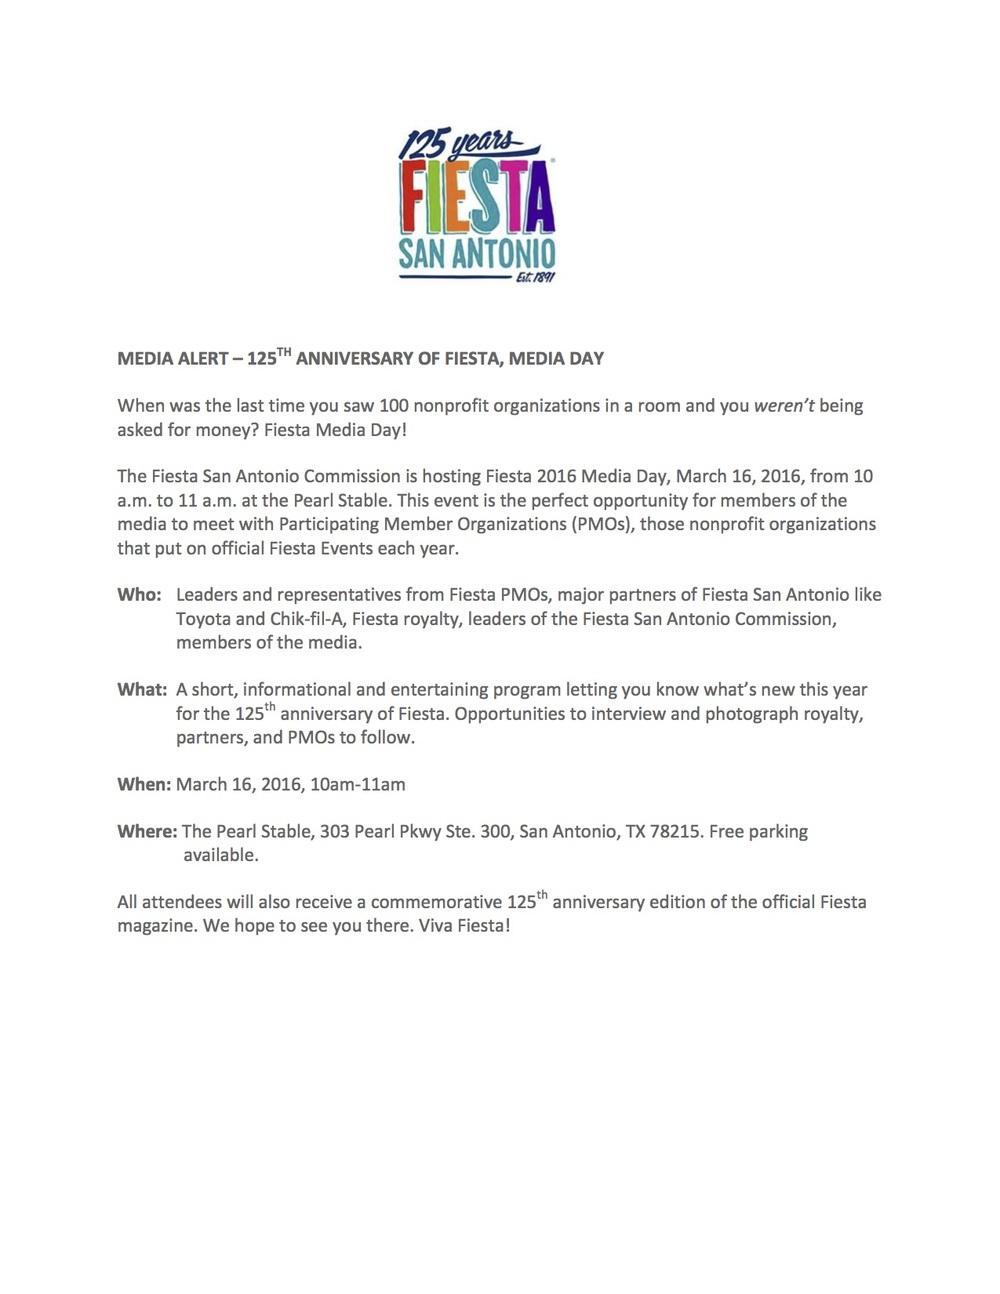 Media Alert: Fiesta Media Day